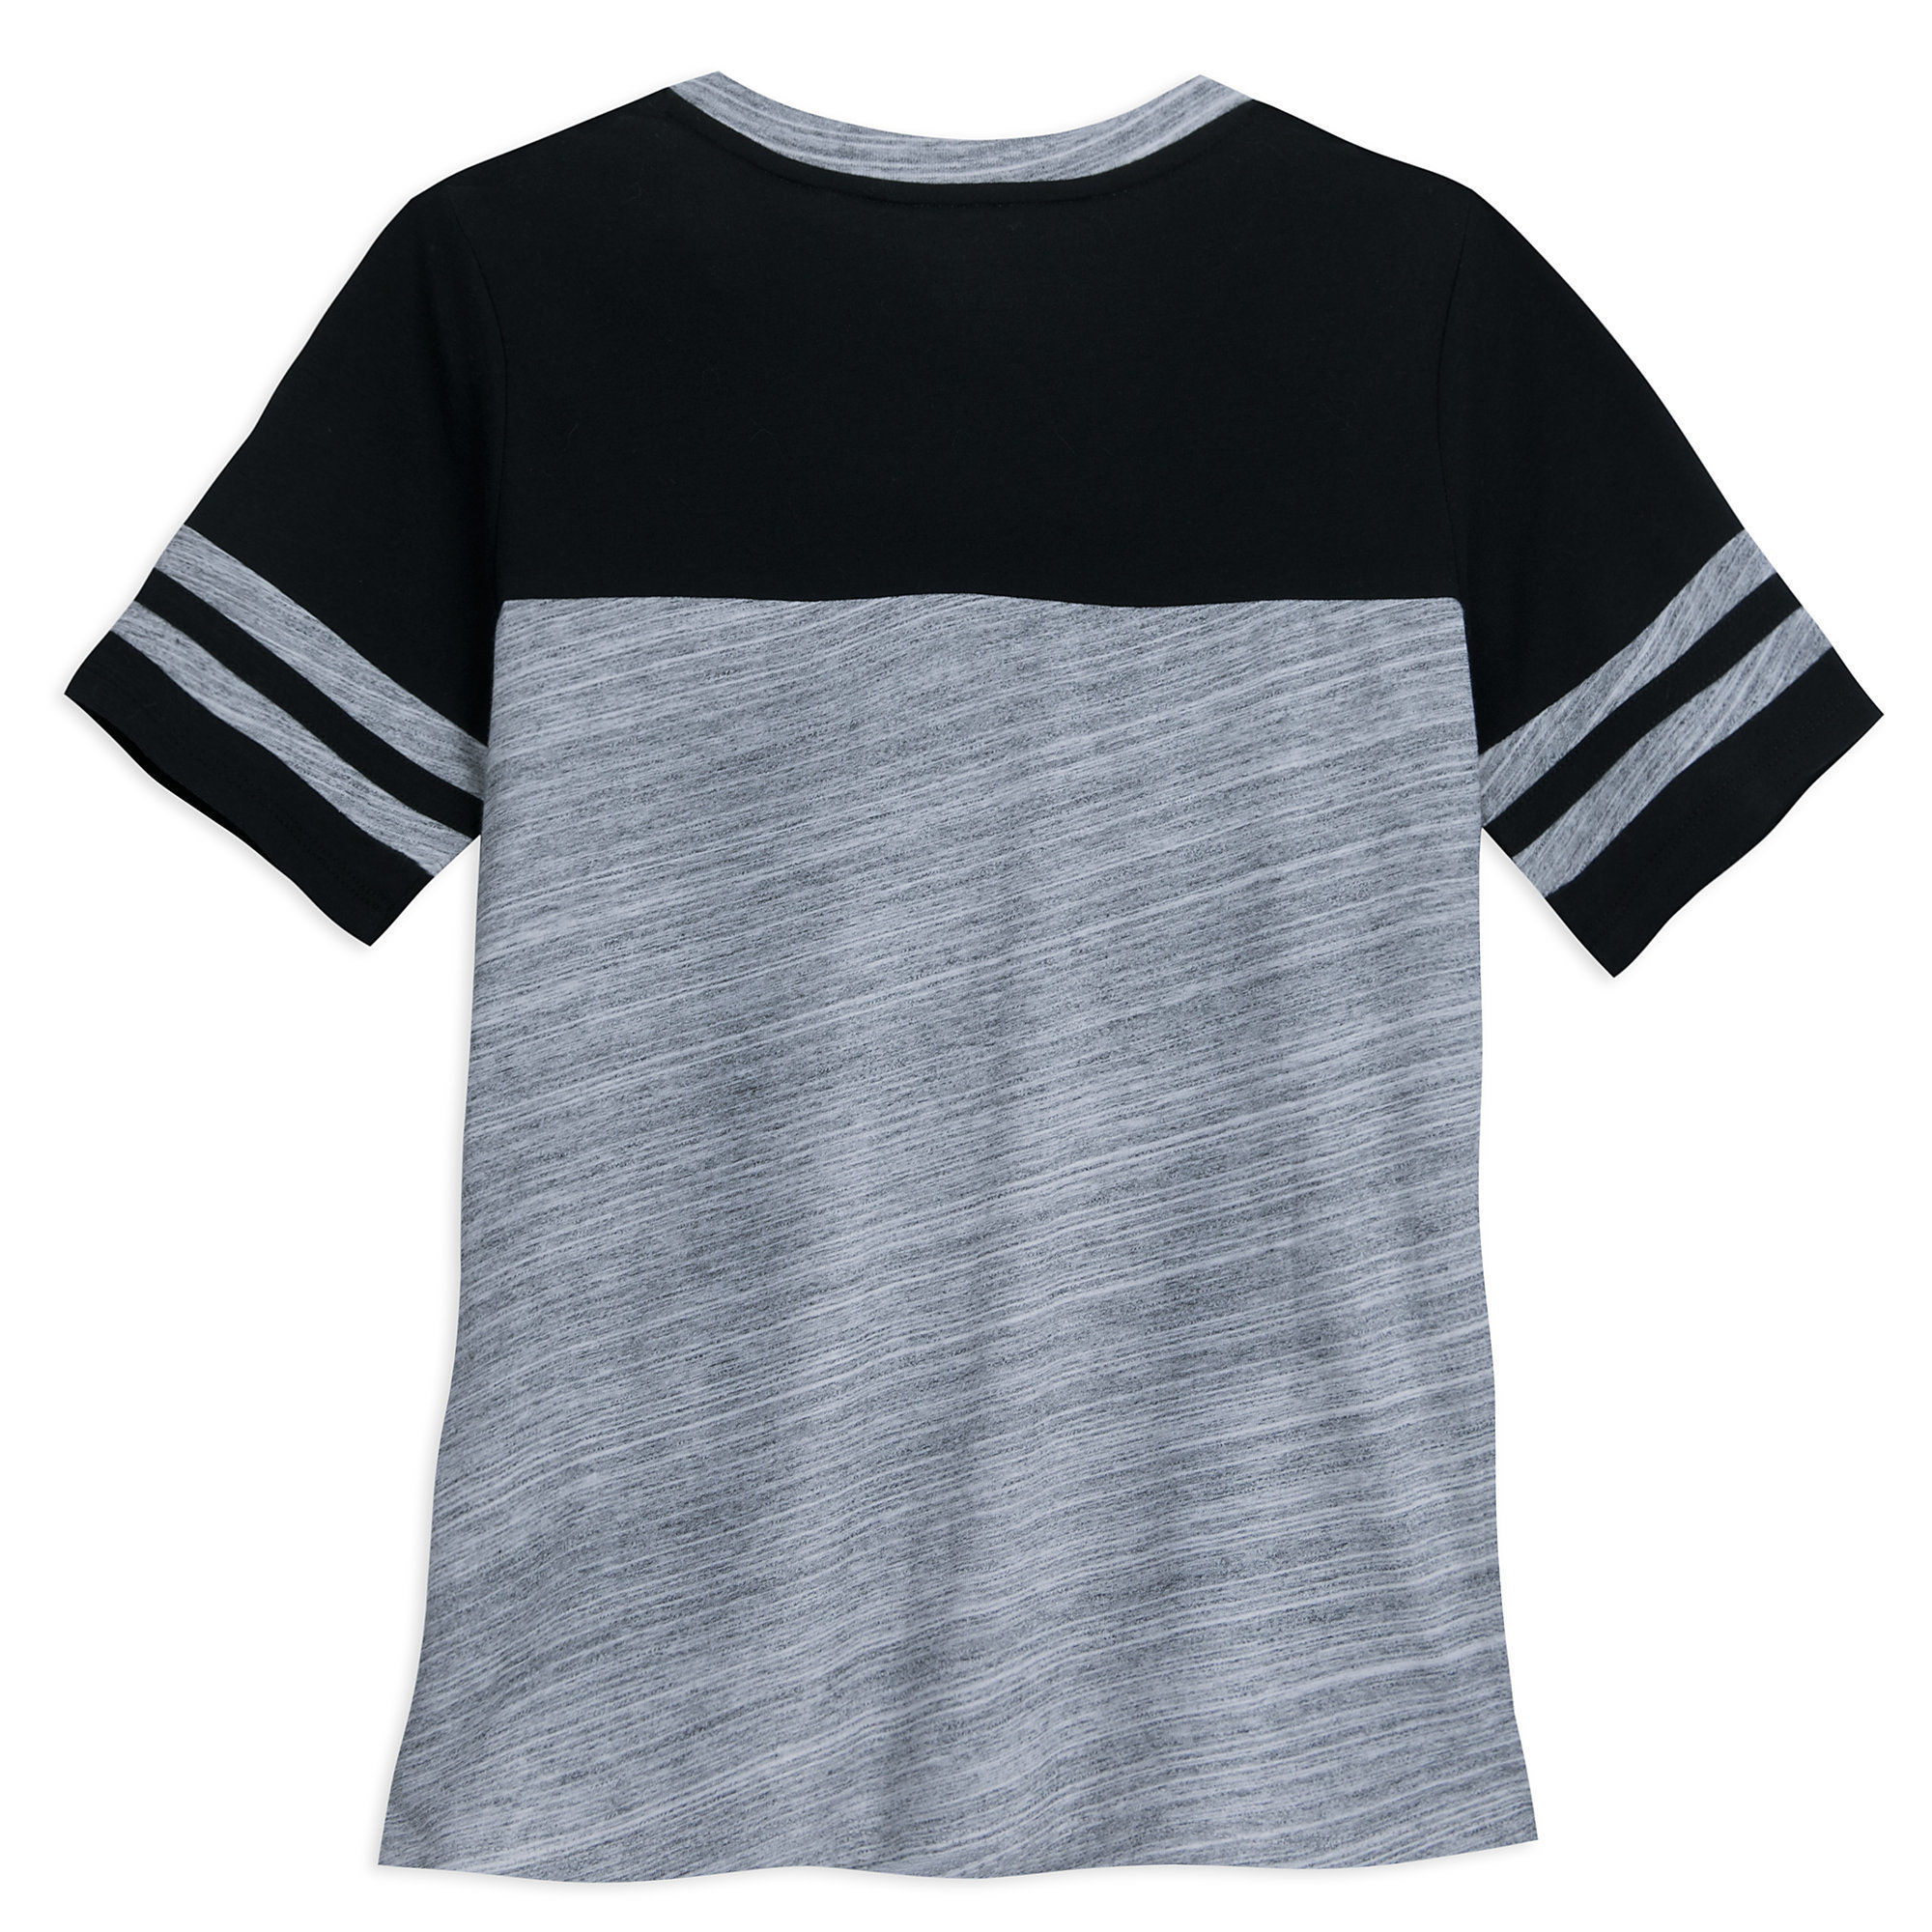 Women's Star Wars Logo Football Style T-Shirt at Shop Disney